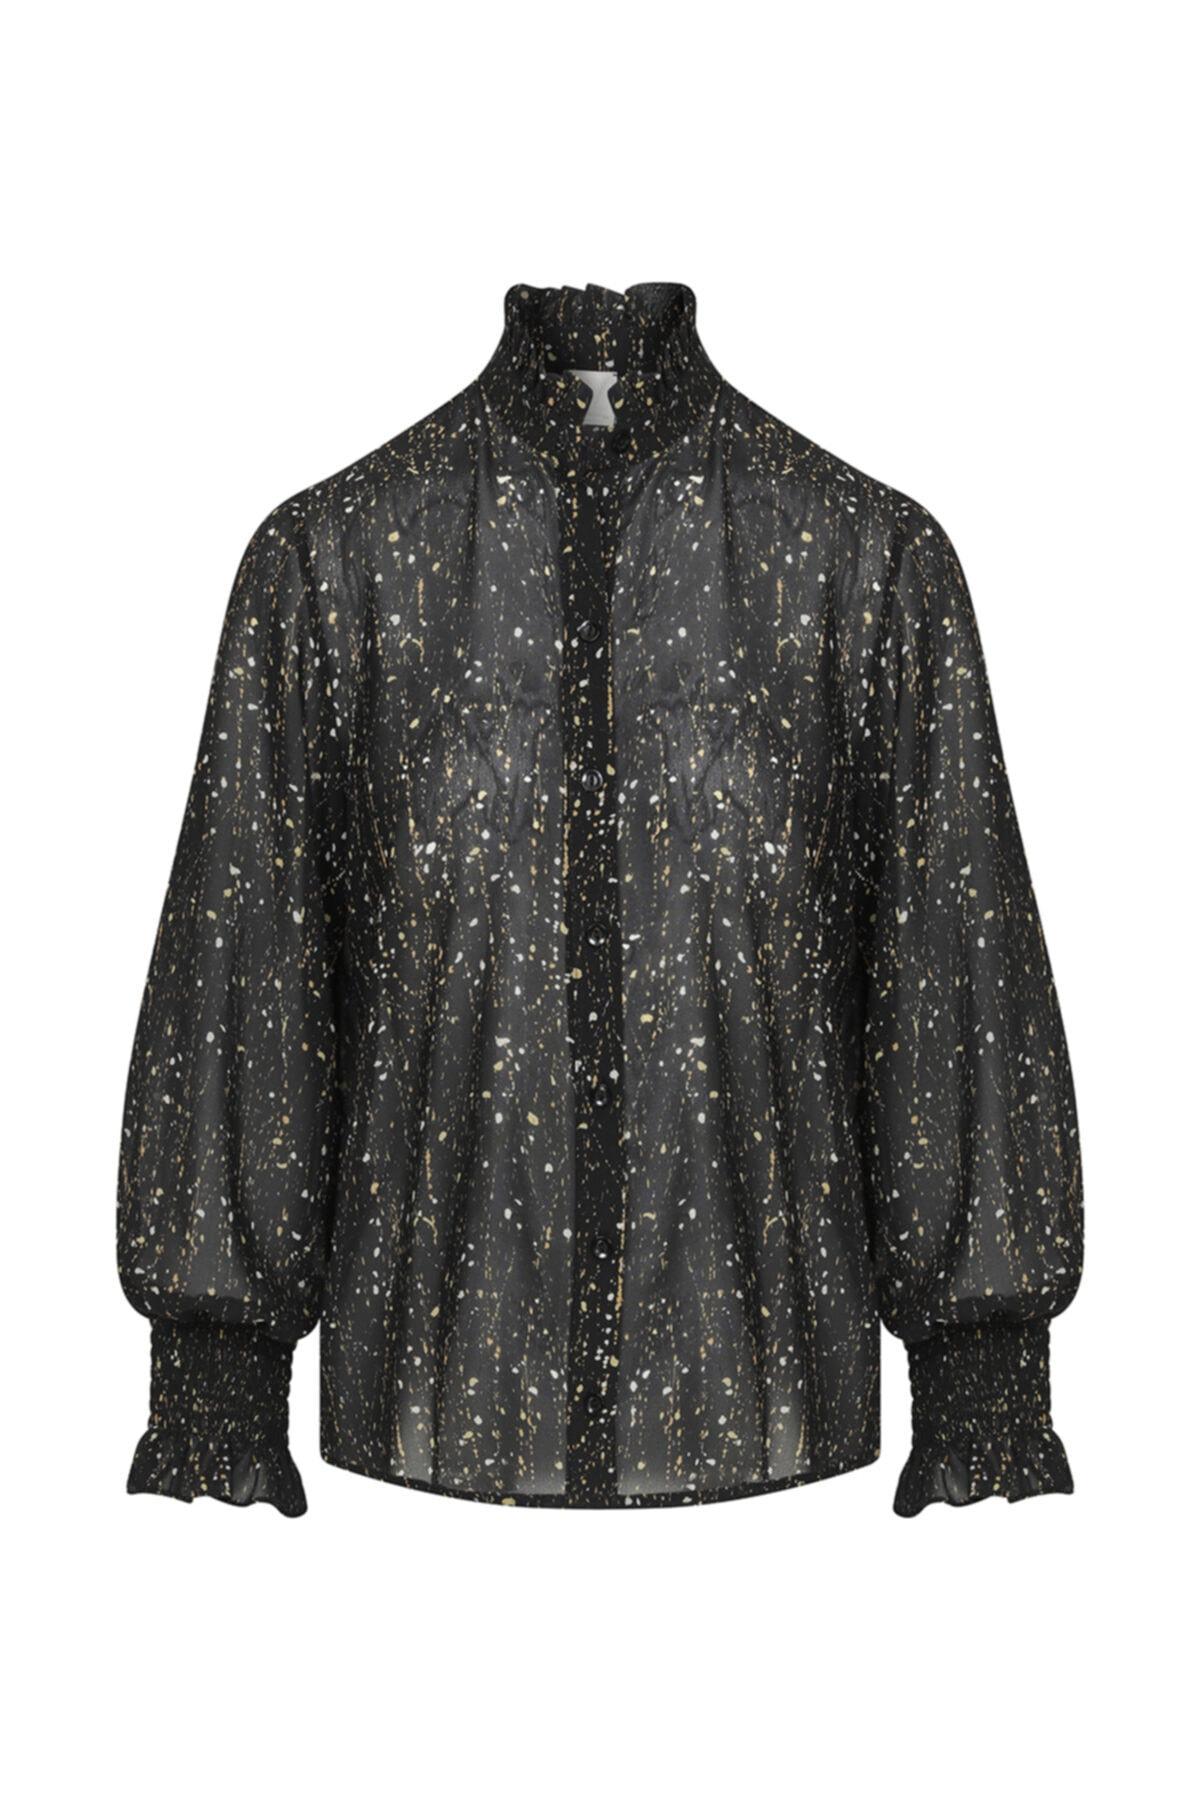 W Collection Kolları Içten Elastikli Desenli Bluz 1